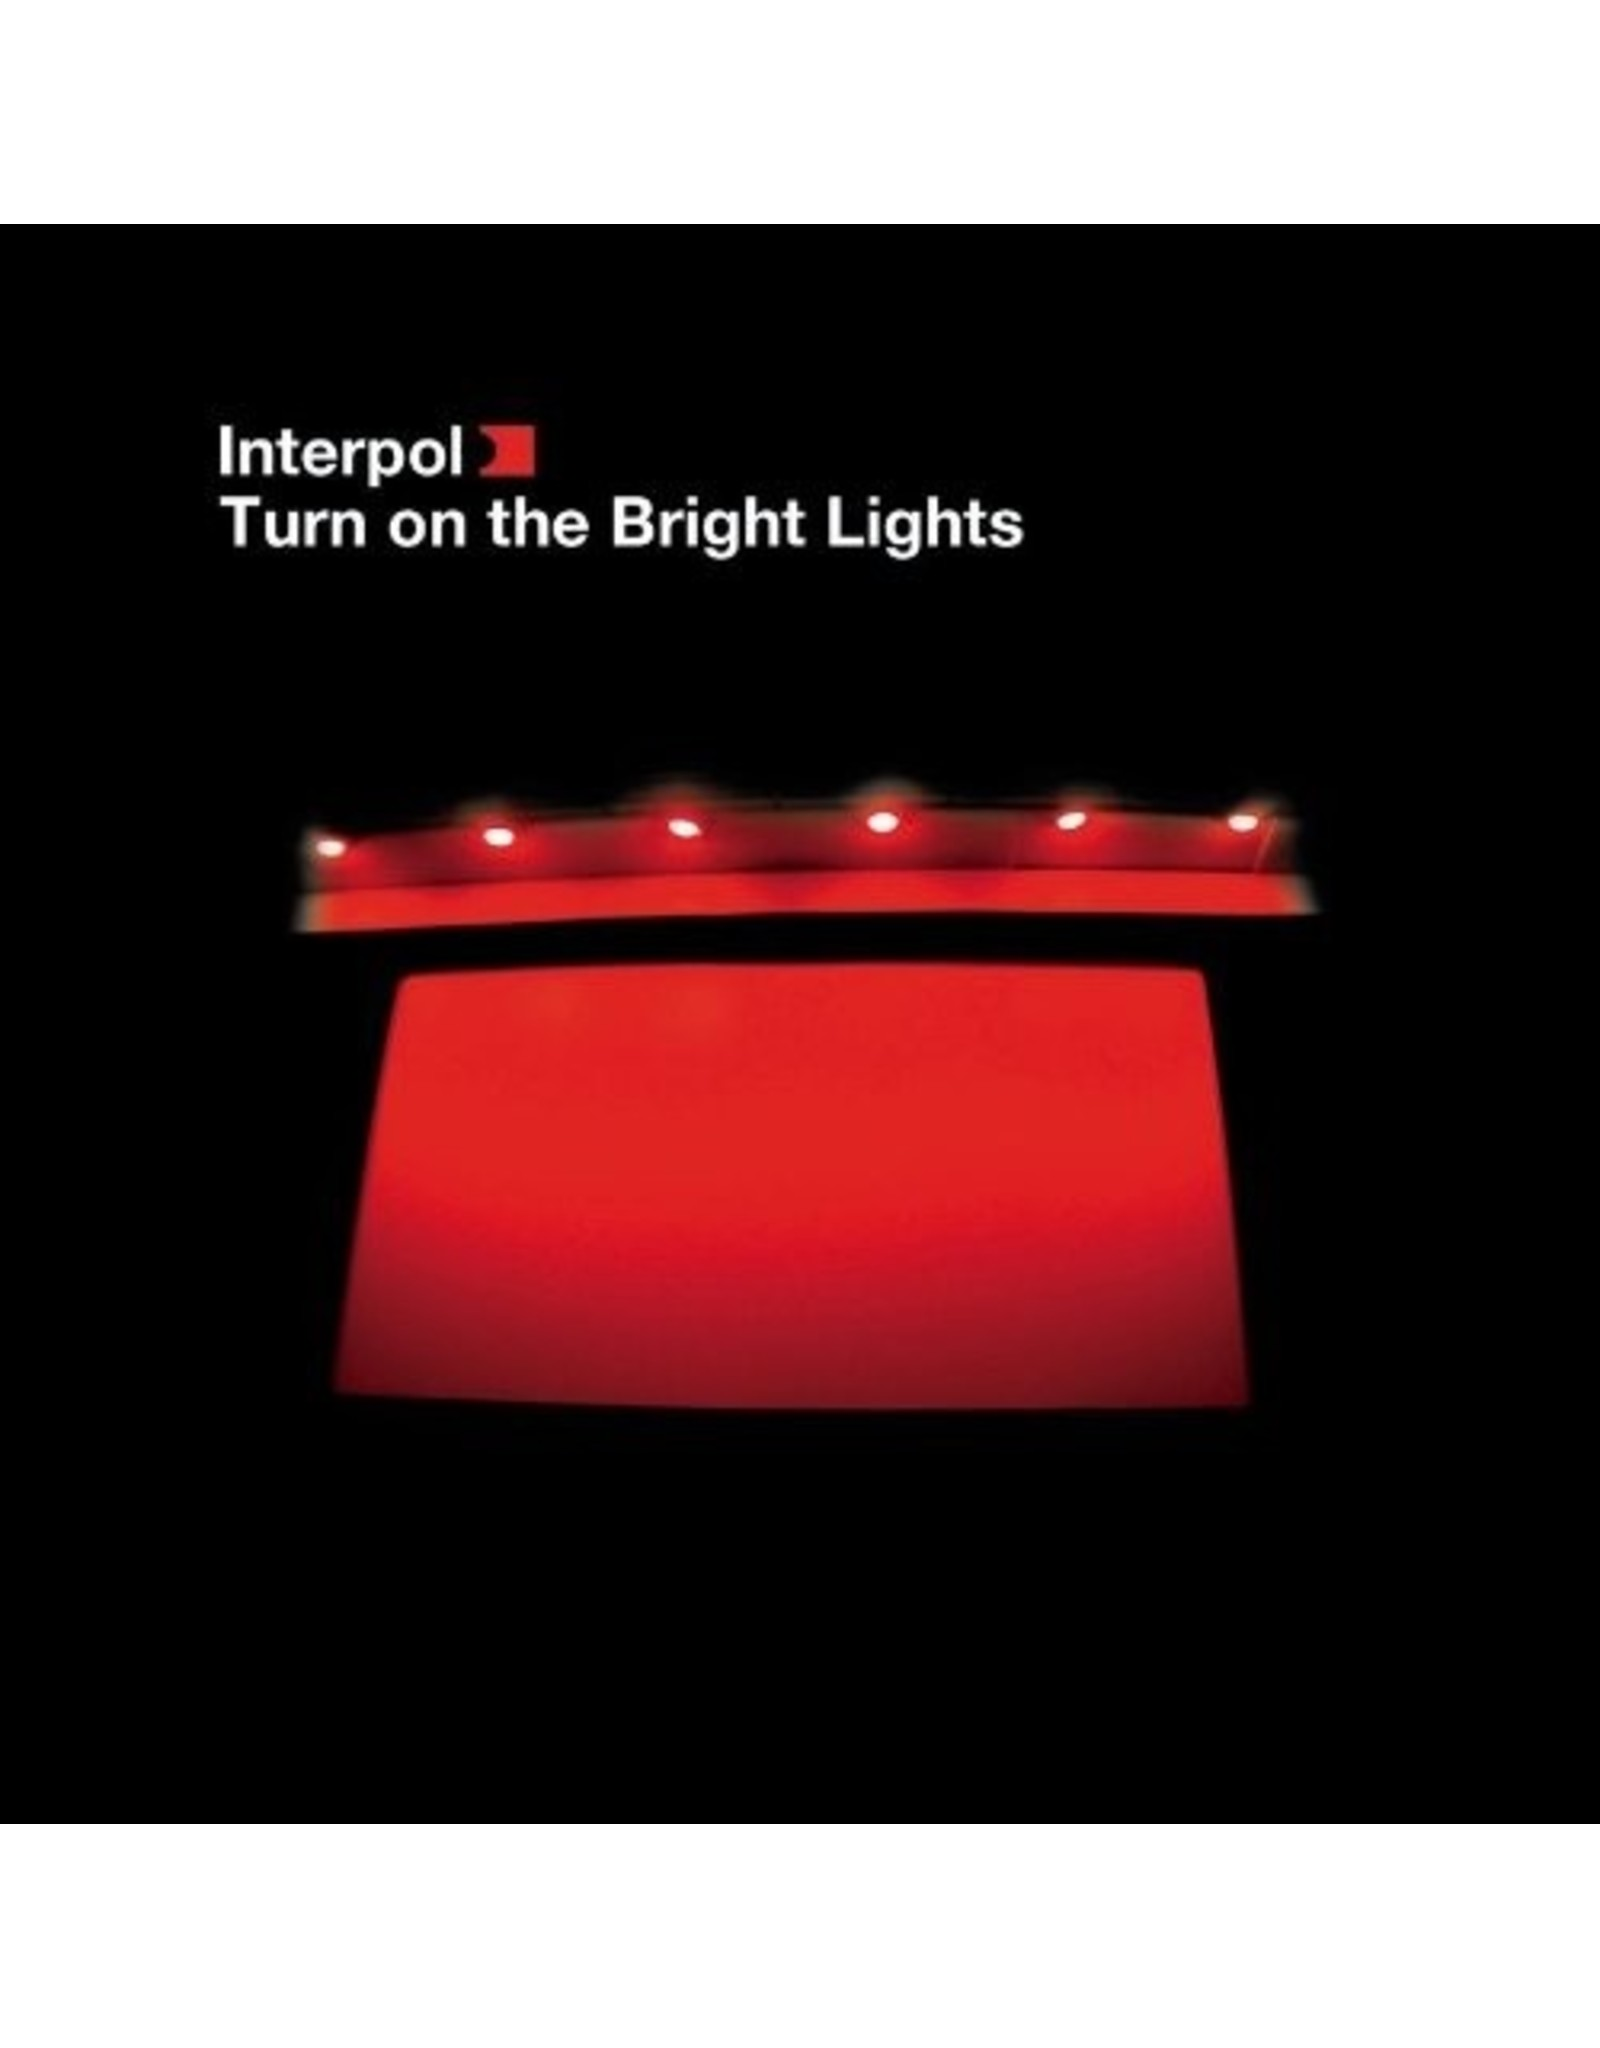 New Vinyl Interpol - Turn On The Bright Lights LP